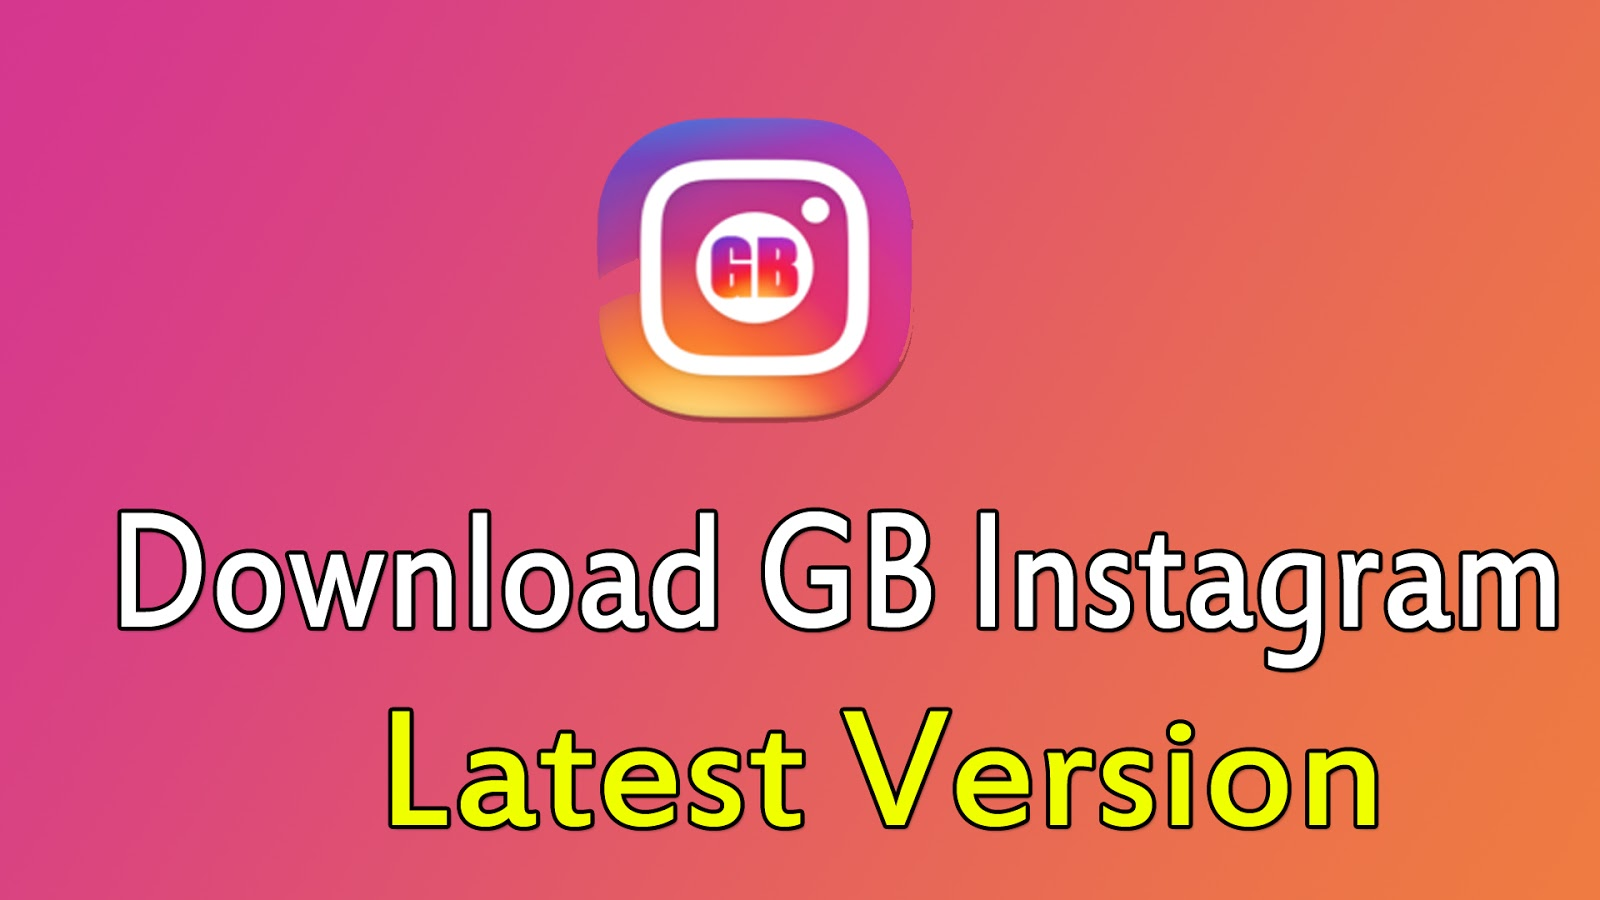 Download gb instagram 1 50 apk | Download Latest Version GB